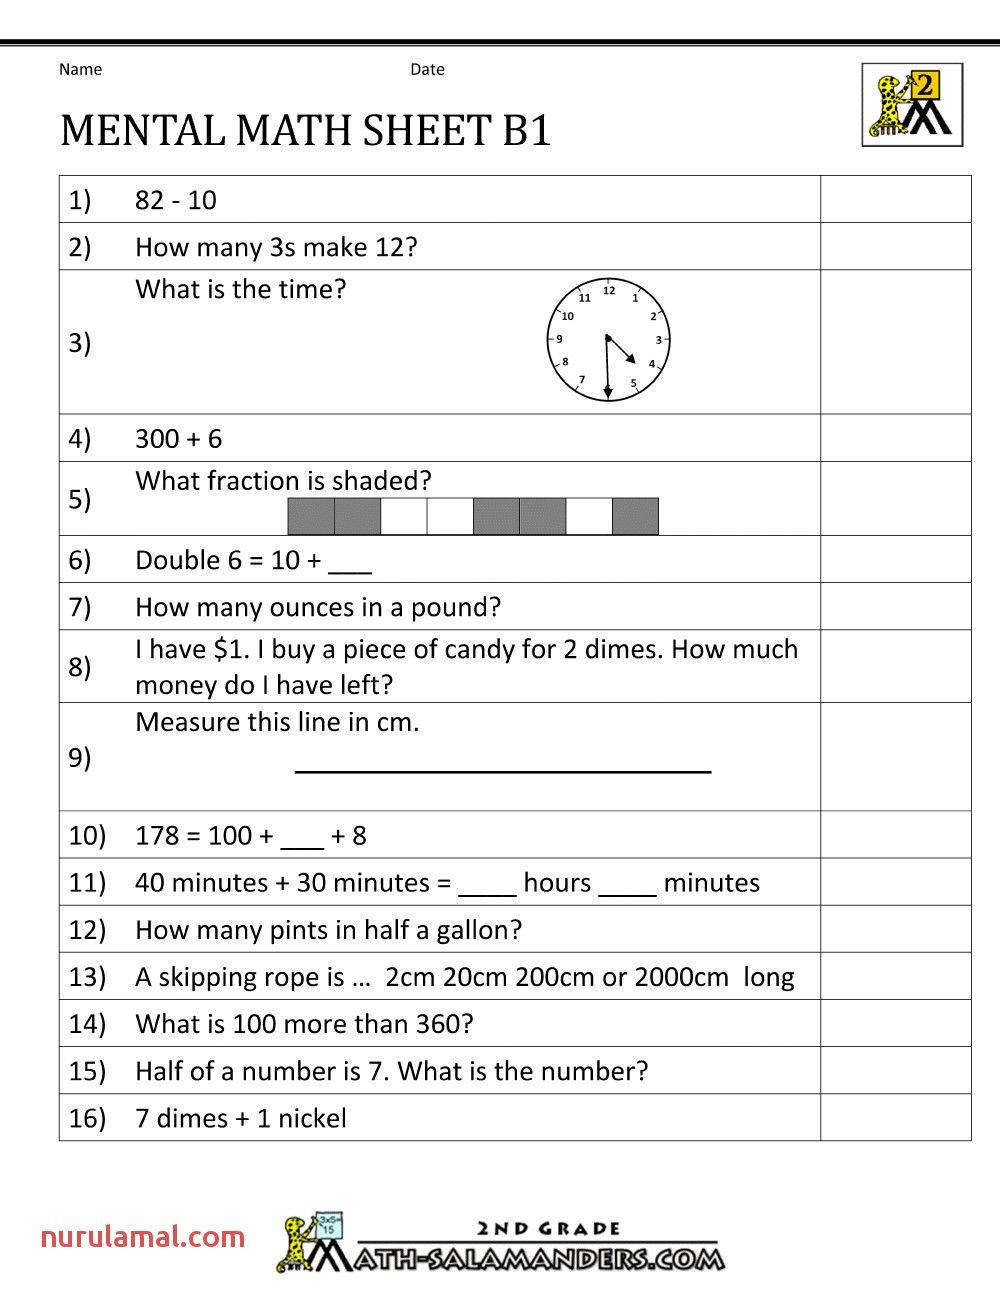 Mental Maths Worksheets For Class 1 Nurul Amal In 2021 Mental Maths Worksheets Mental Math Mental Maths Tests [ 1294 x 1000 Pixel ]